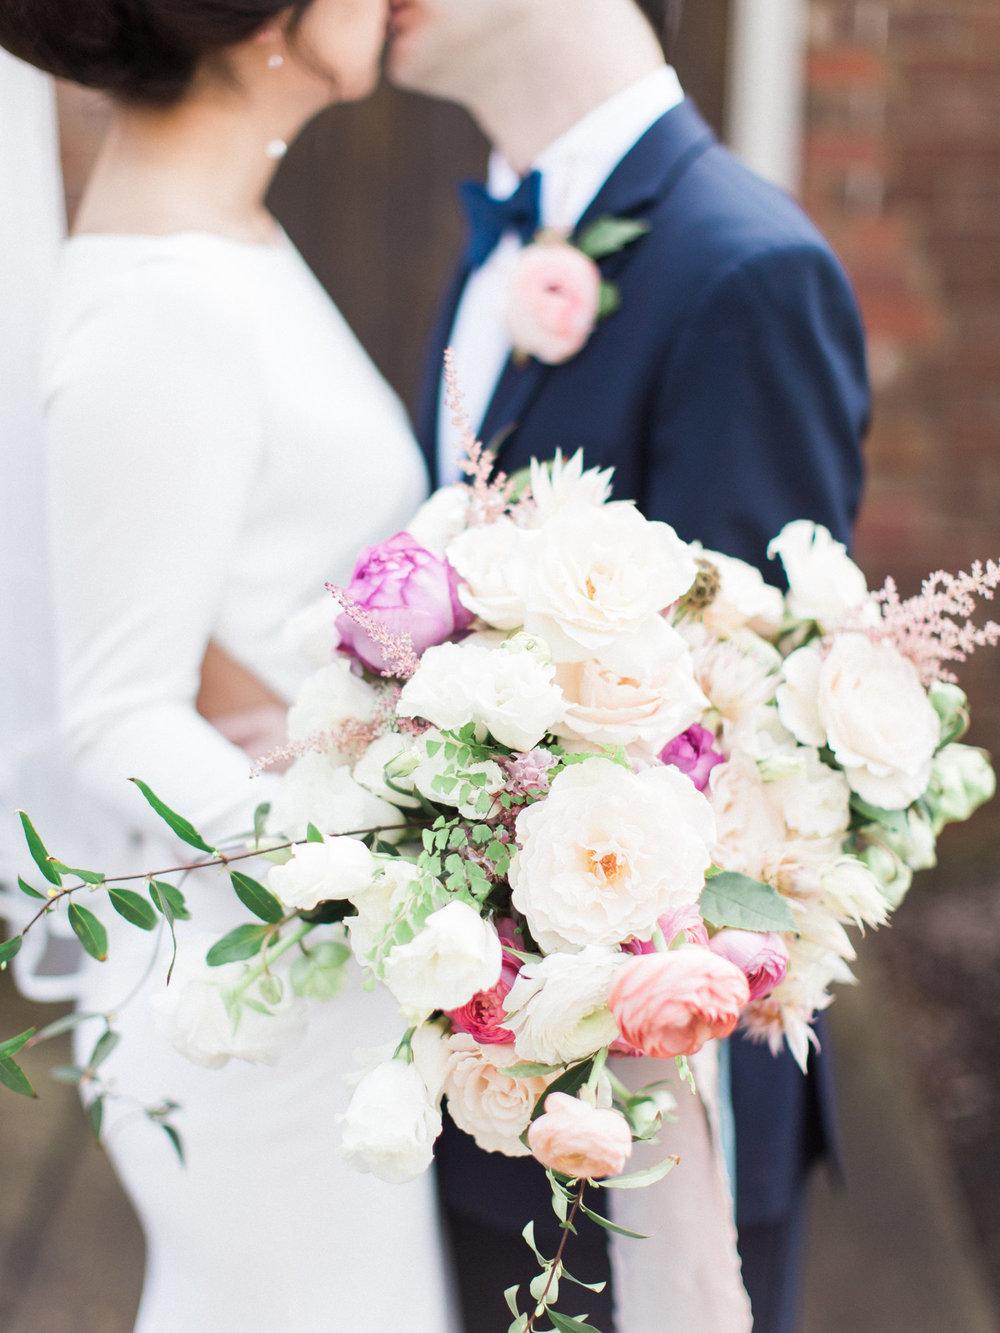 Bridal Flowers by Deanna Burks Design |  Visual: Jordan & Alaina Photograph